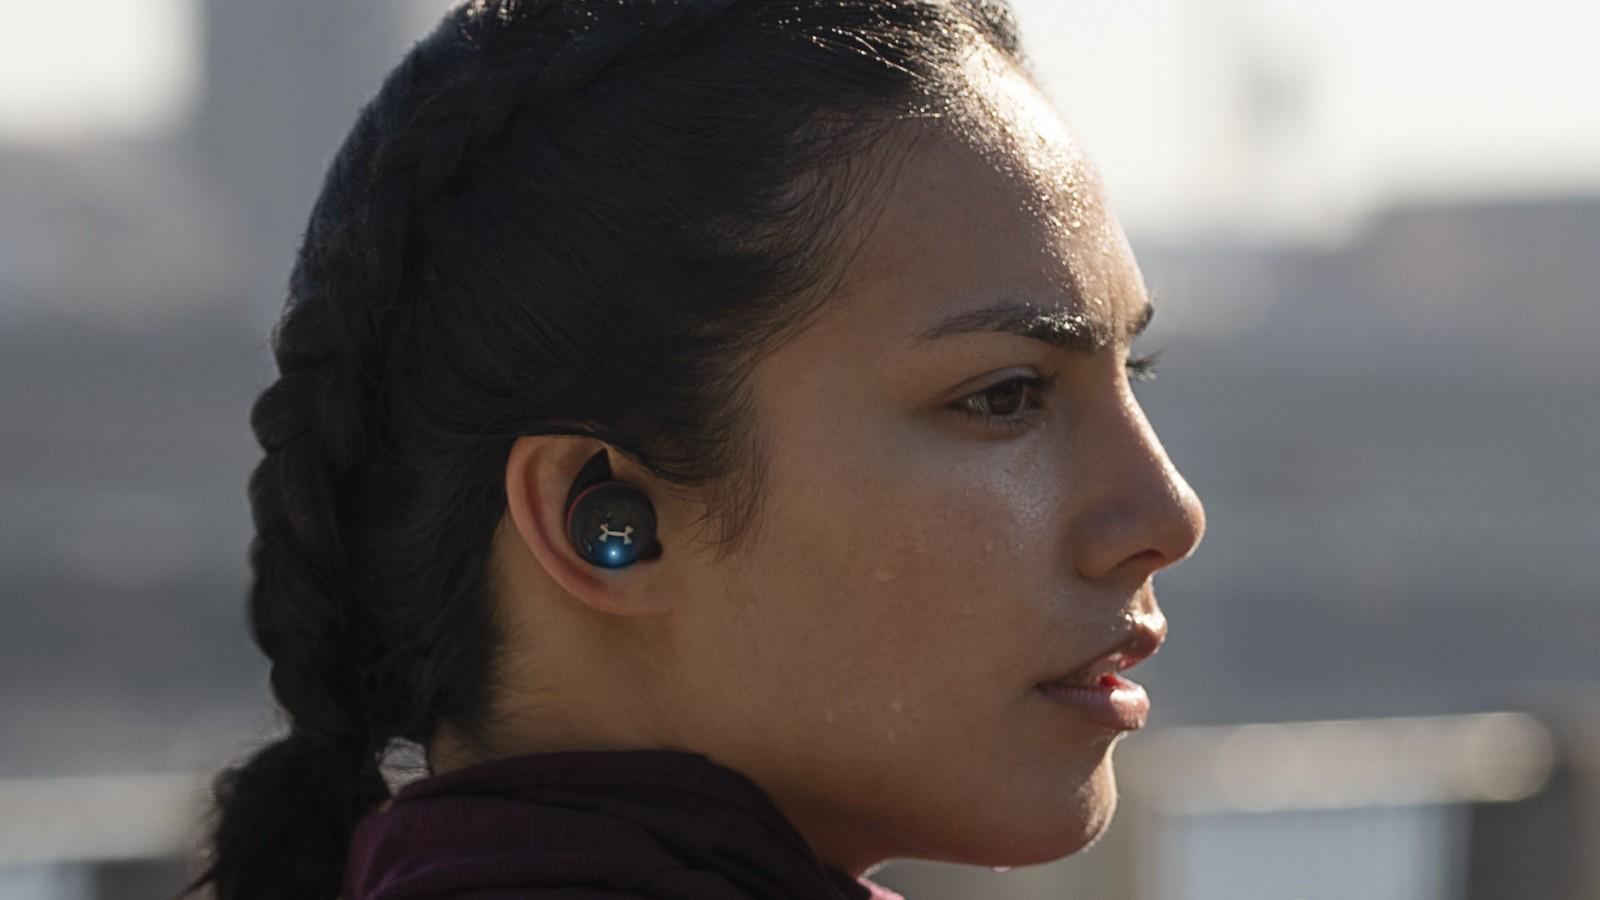 JBL x Under Armour True Wireless Flash bass-boosting earbuds are sweatproof